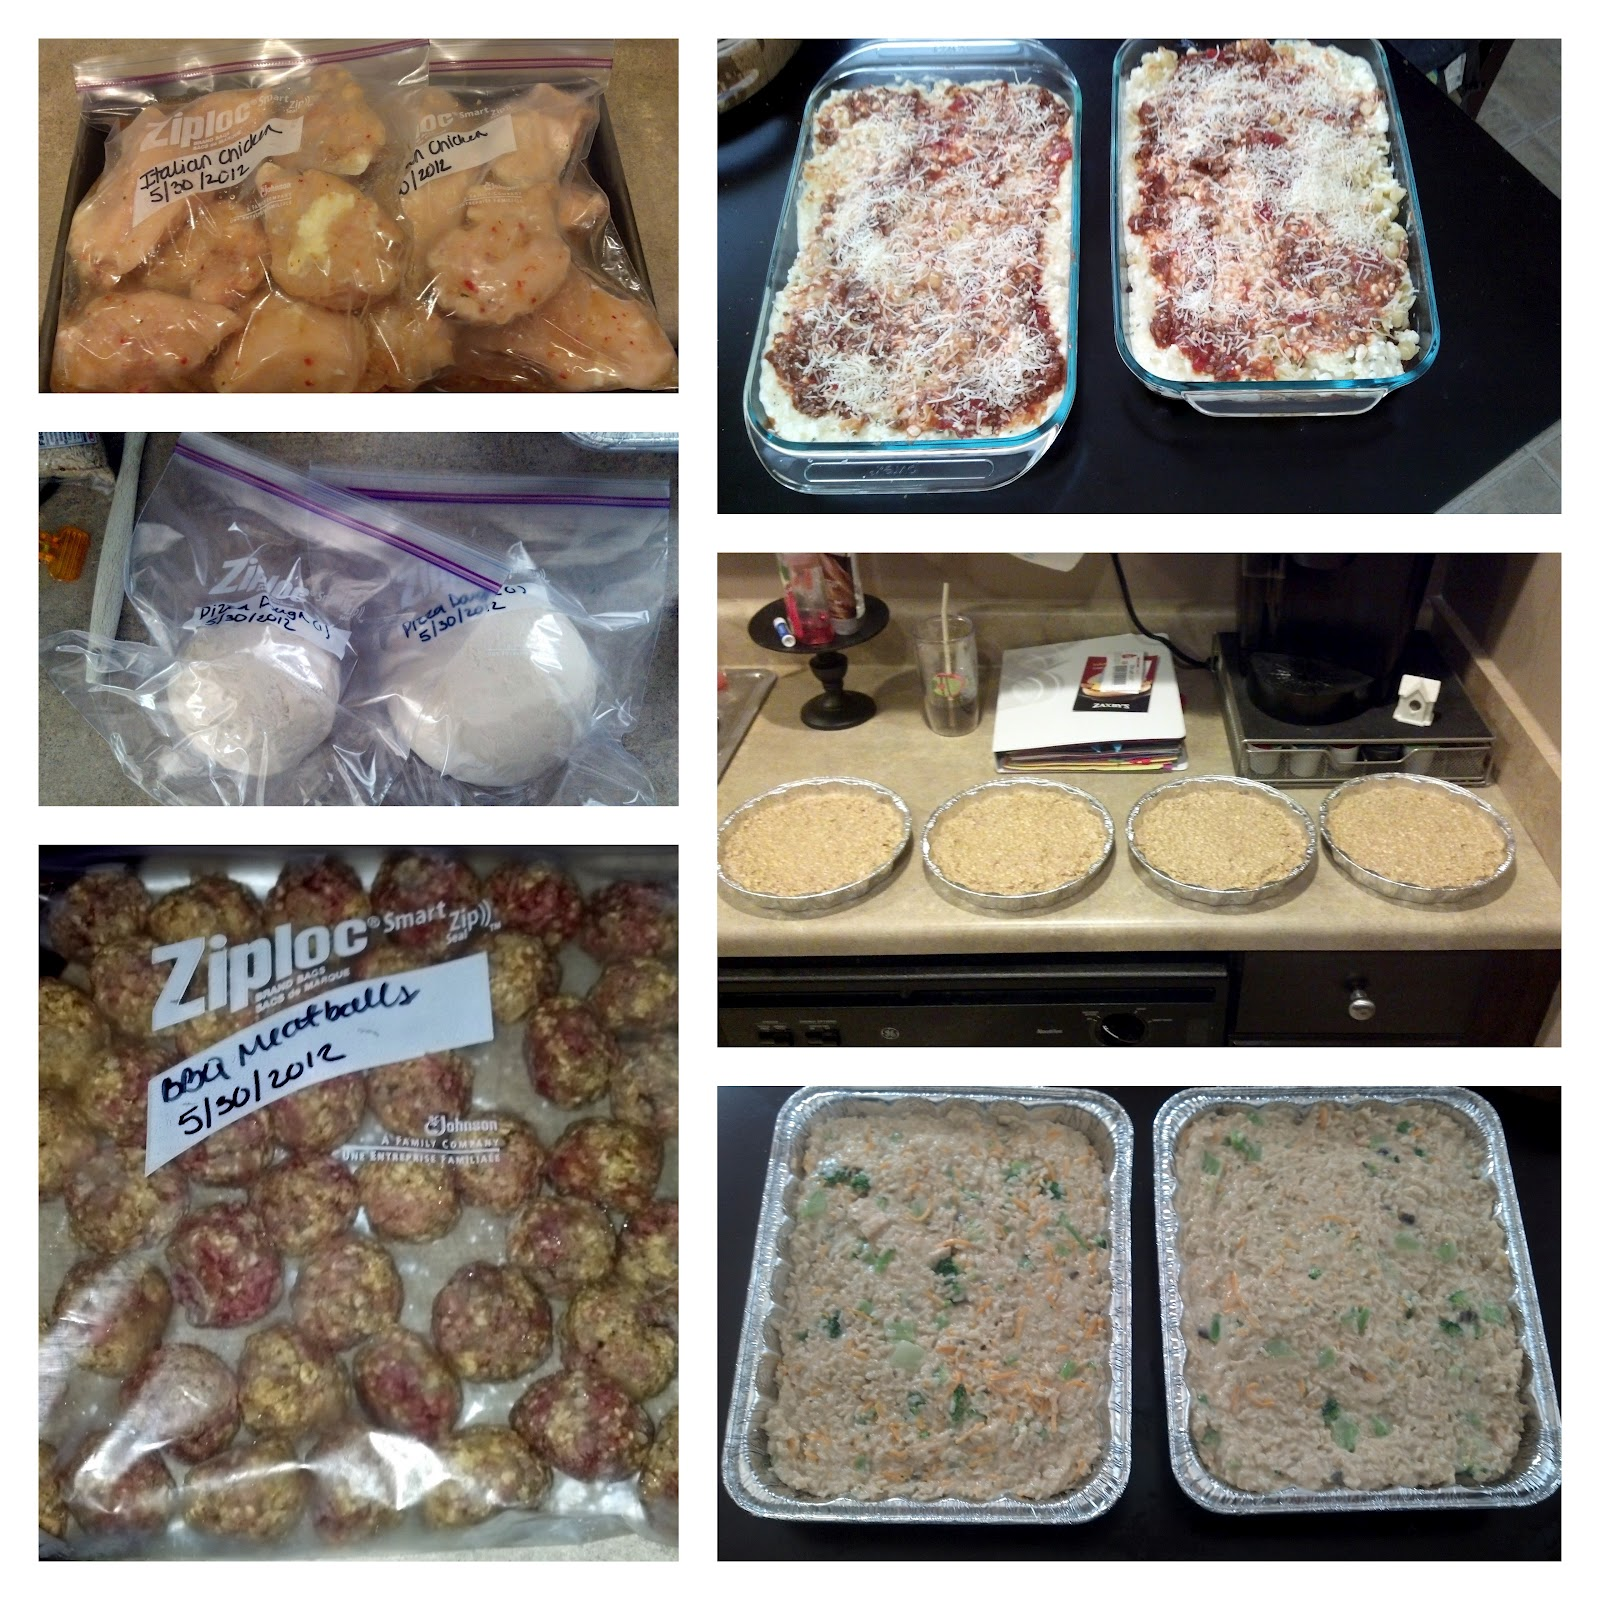 http://houseofwoyaks.blogspot.com/2012/06/freezer-cooking-extravaganza.html